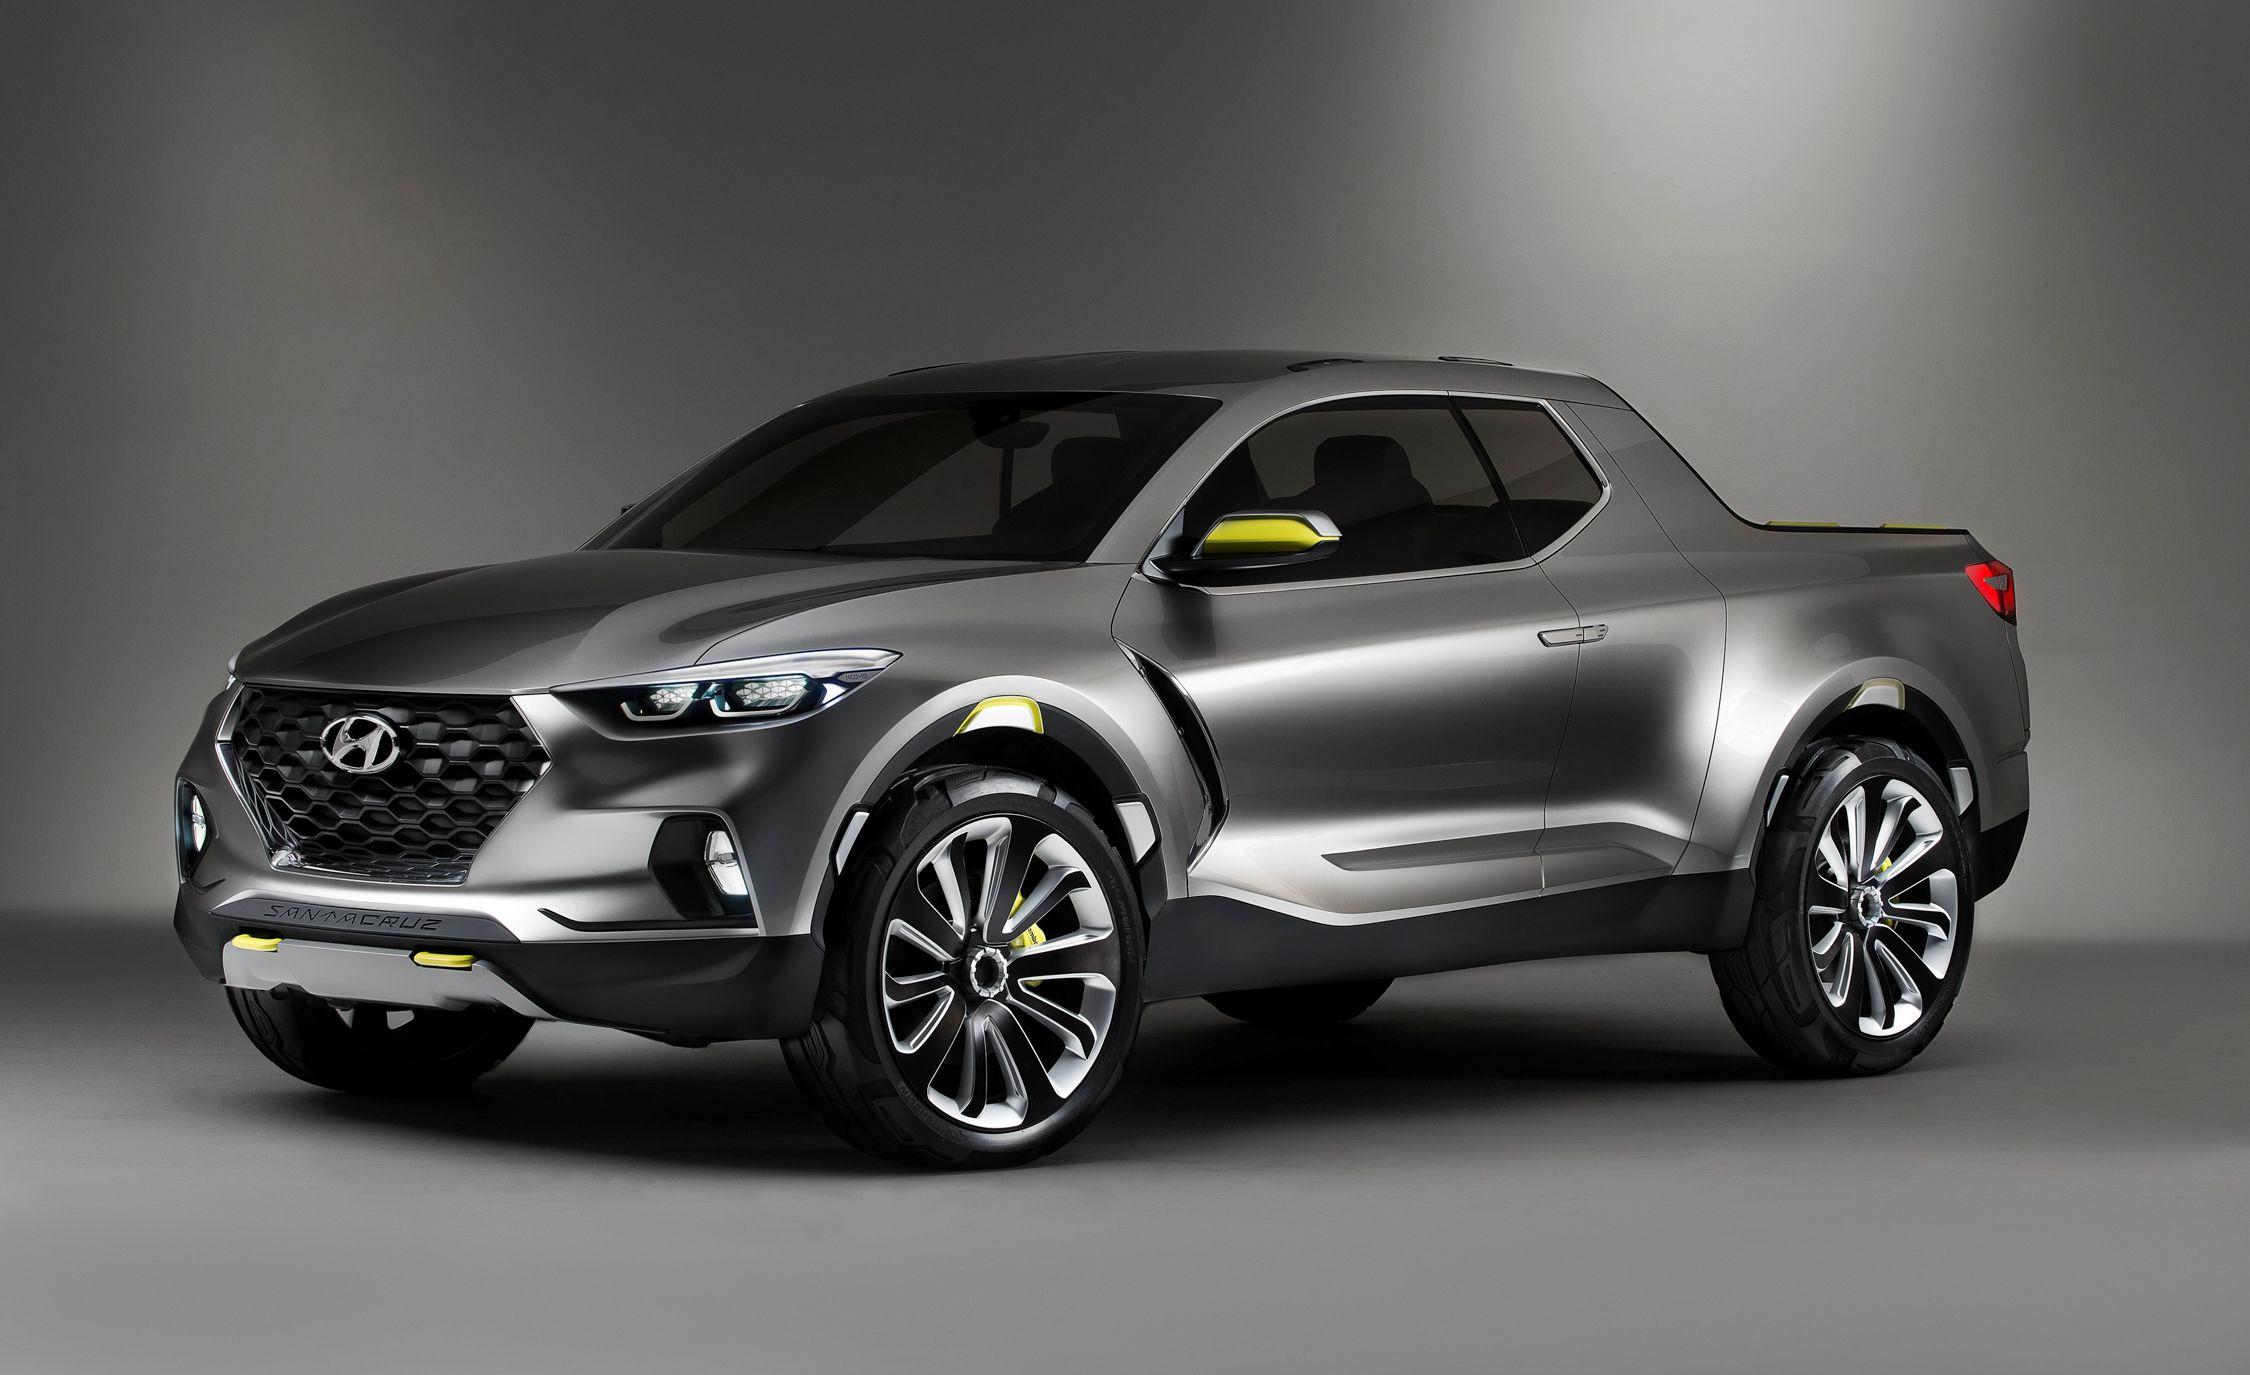 Pick Up Hyundai 2017 >> Hyundai Santa Cruz Crossover Concept Pictures Photo Gallery